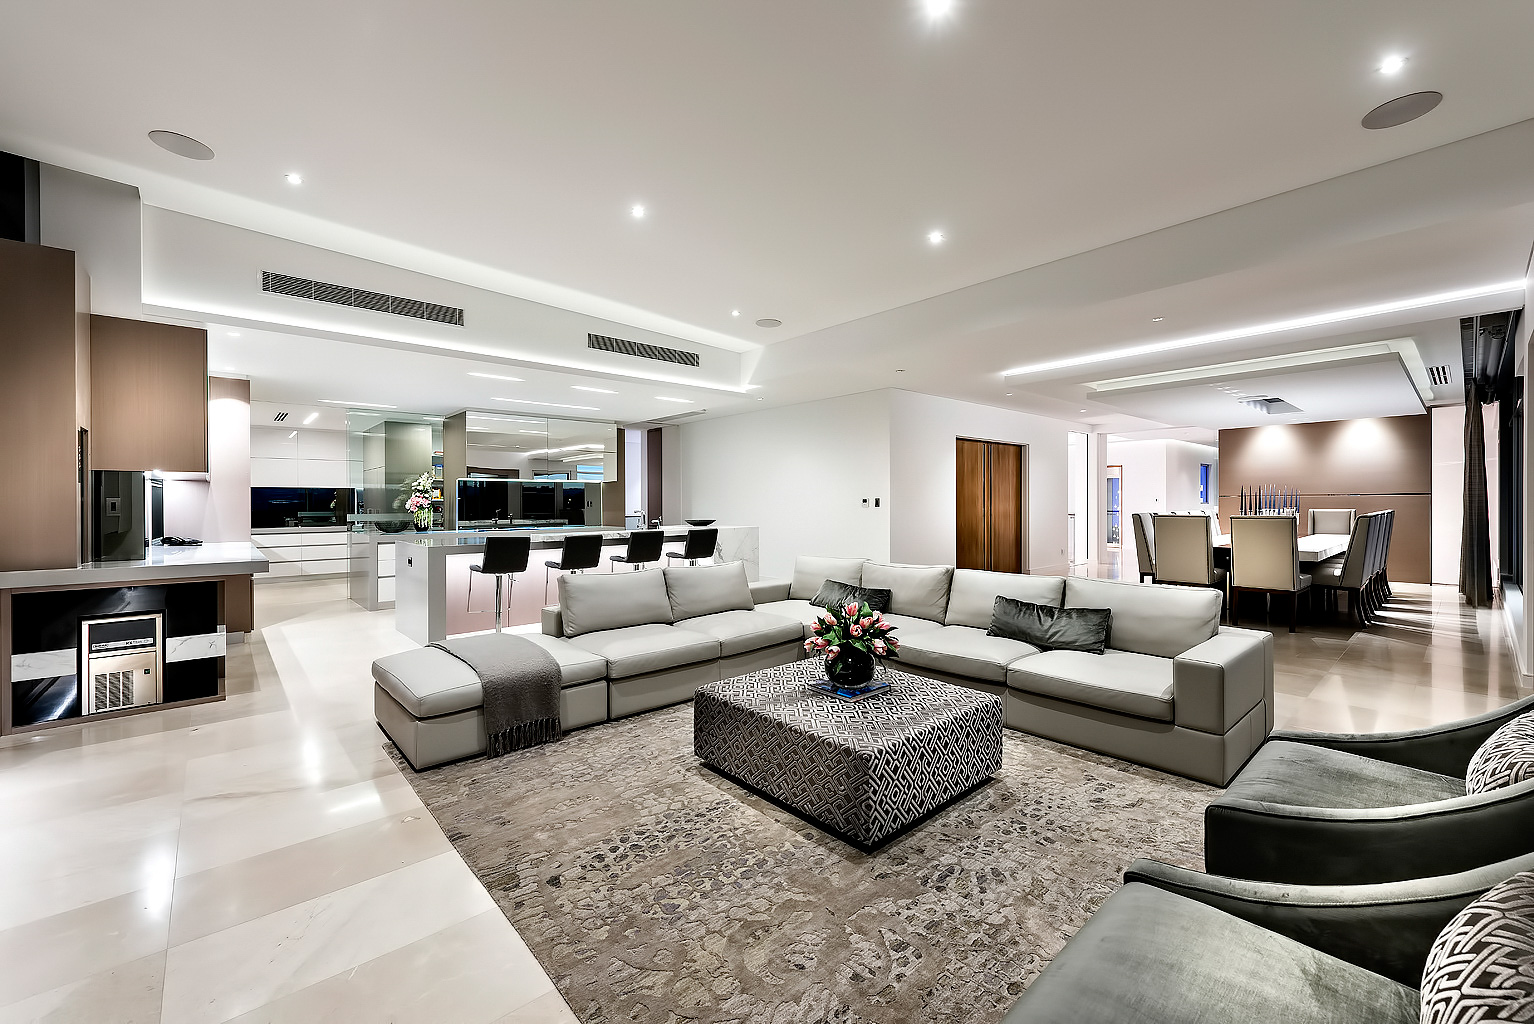 11 – Perth Luxury Residence – Seaward Loop, Sorrento, WA, Australia